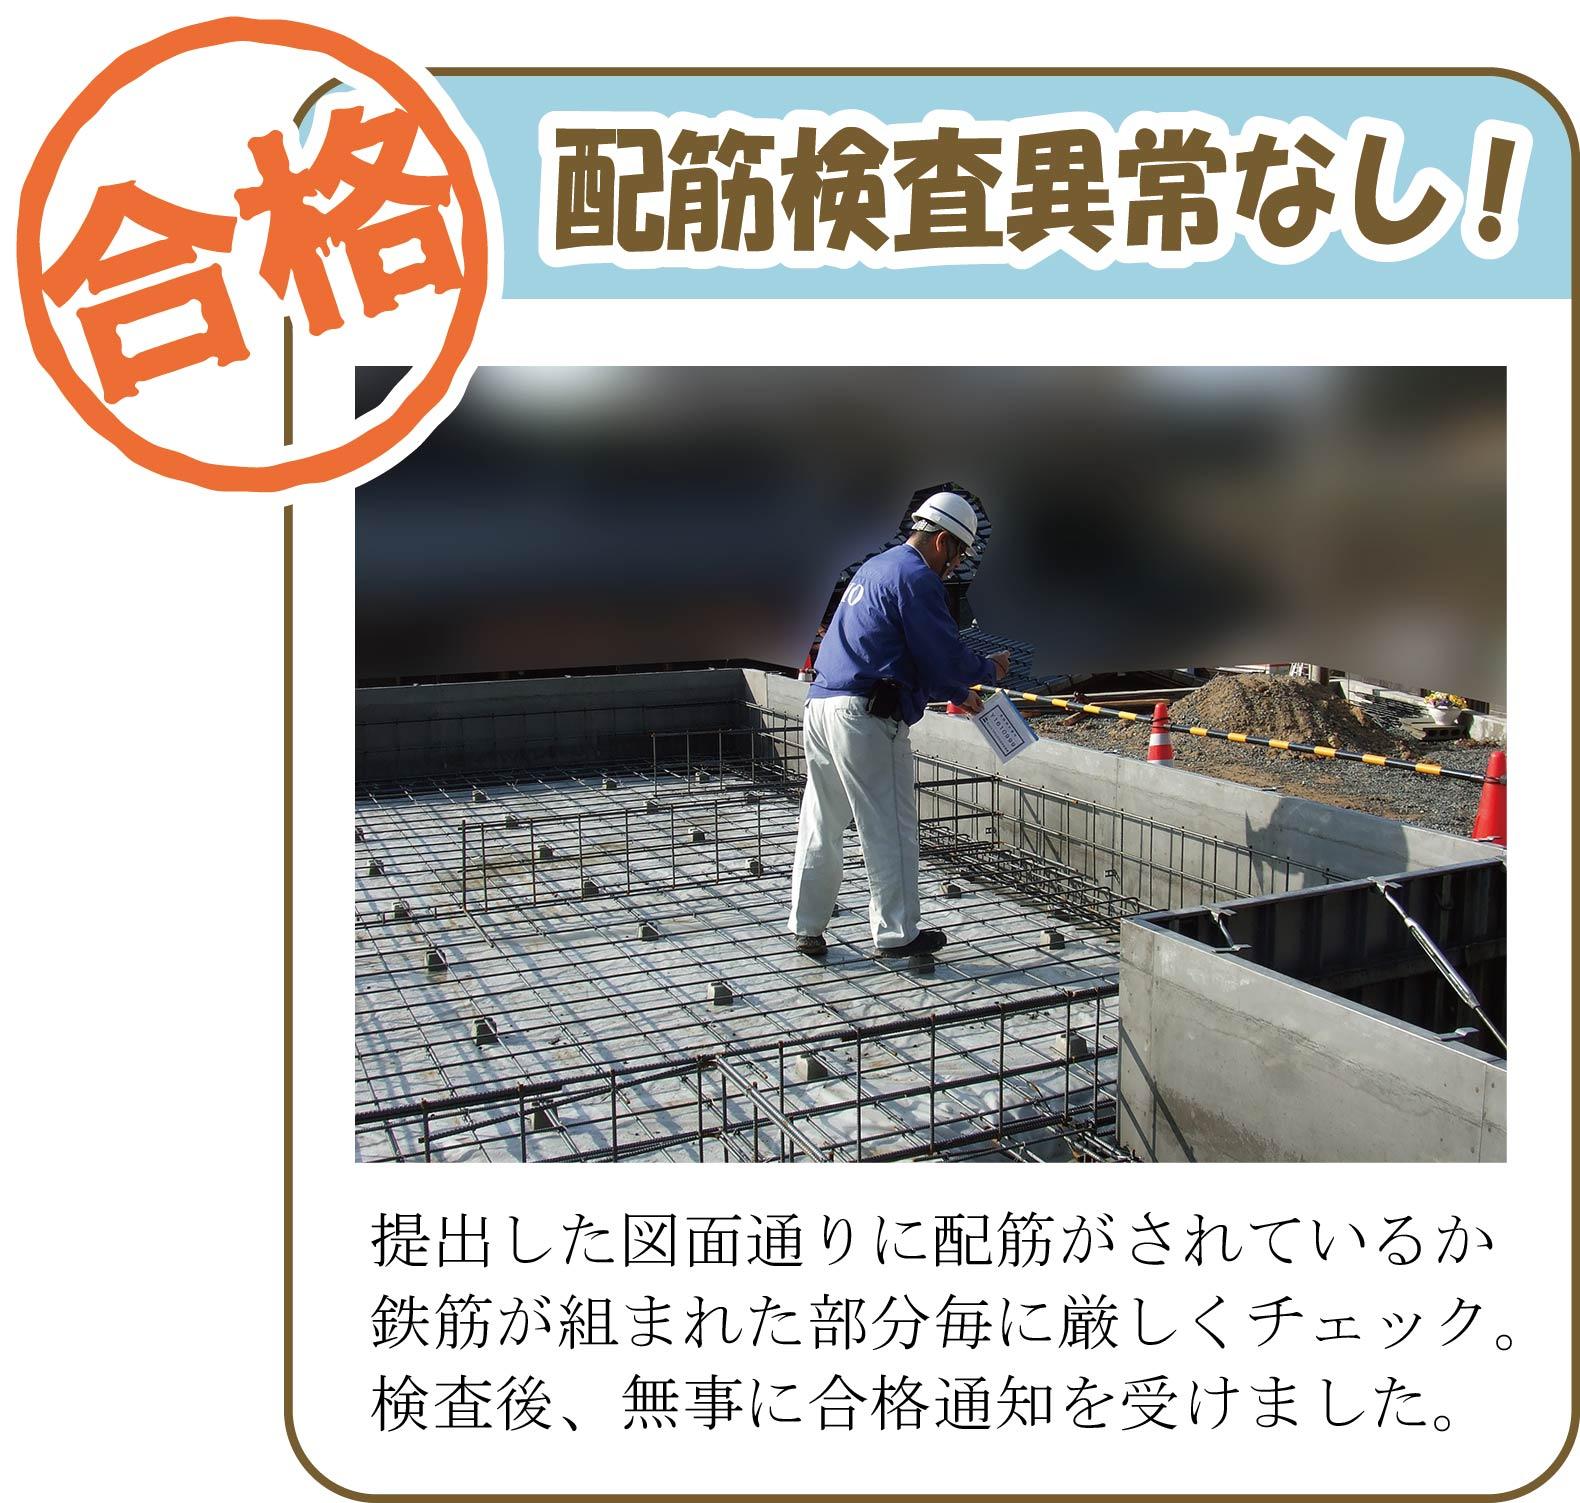 KuraSi-natu-sin83-10.jpg